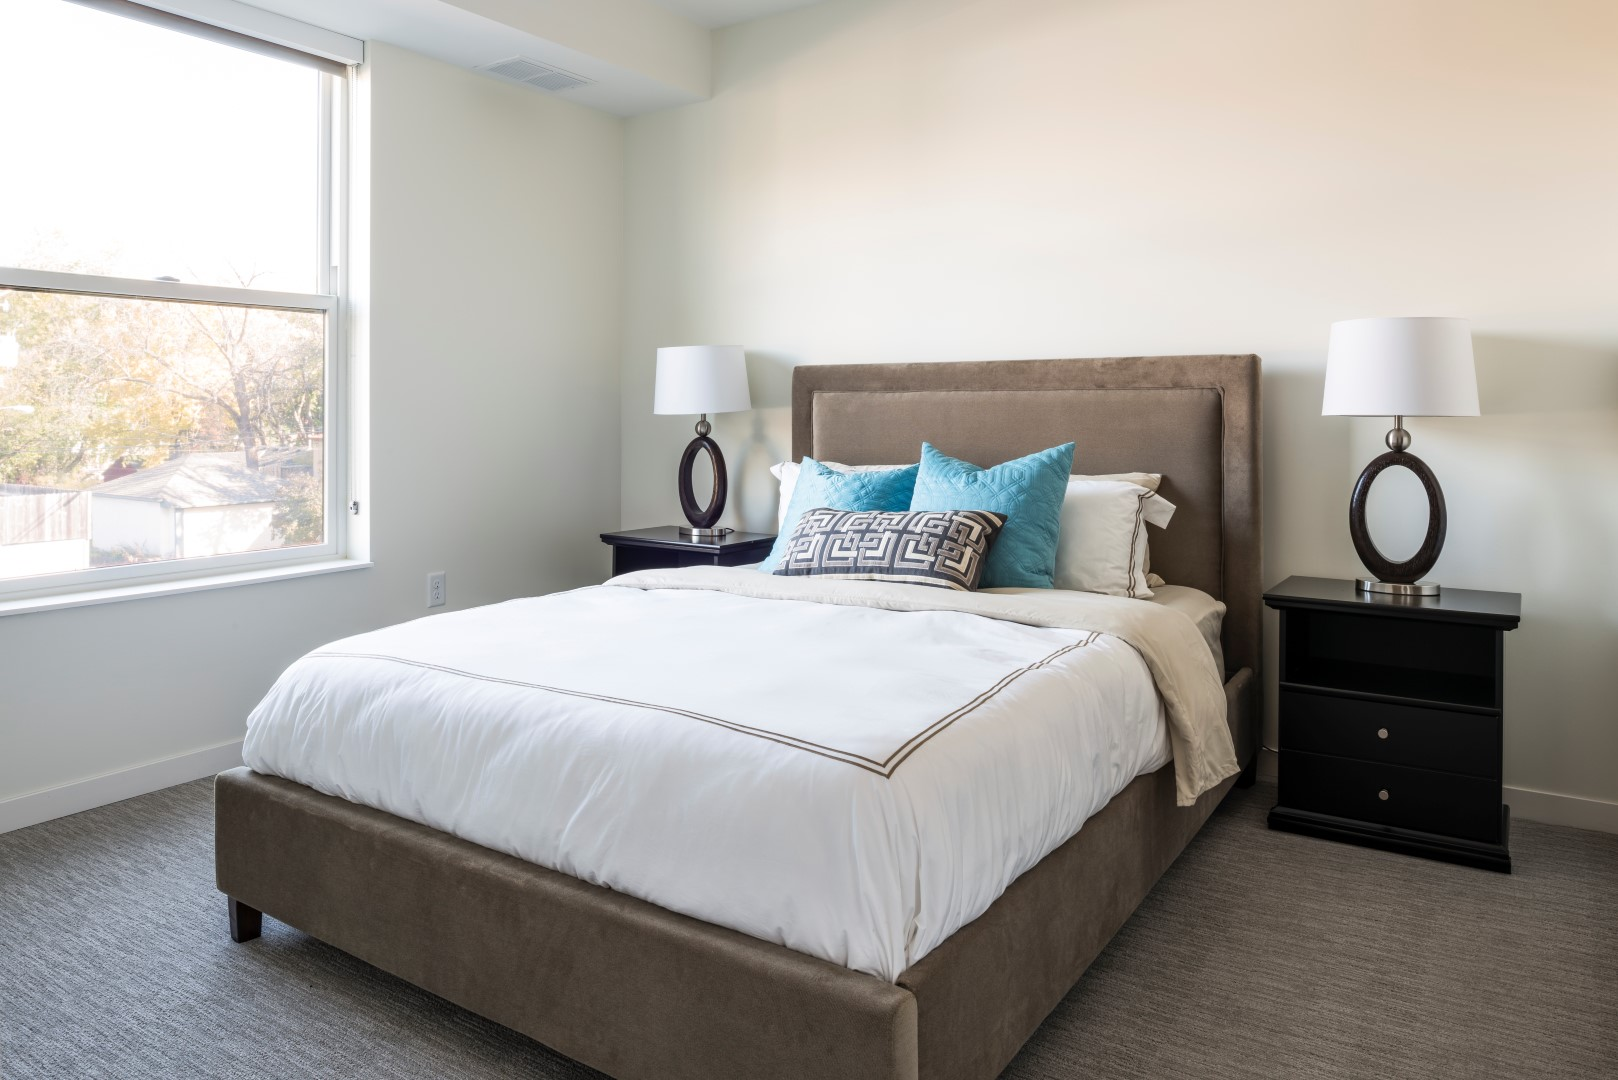 Elements-of-Linden-Hills-Apartment-Minneapolis-Minnesota-Interior9 (Large).jpg